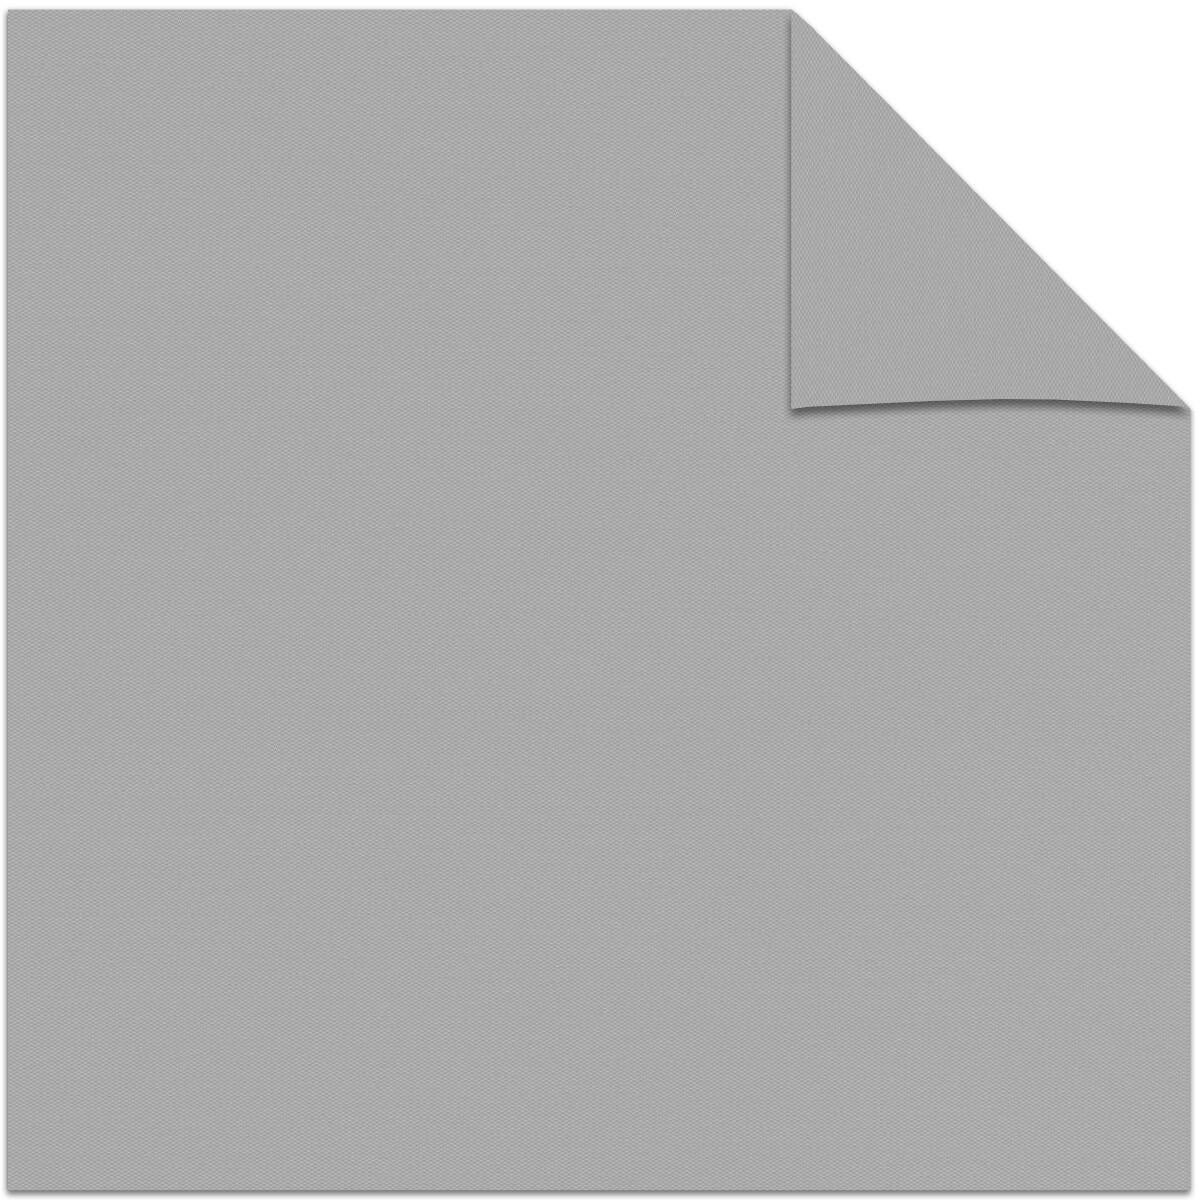 Tenda a rullo oscurante INSPIRE Tokyo grigio 55 x 160 cm - 2